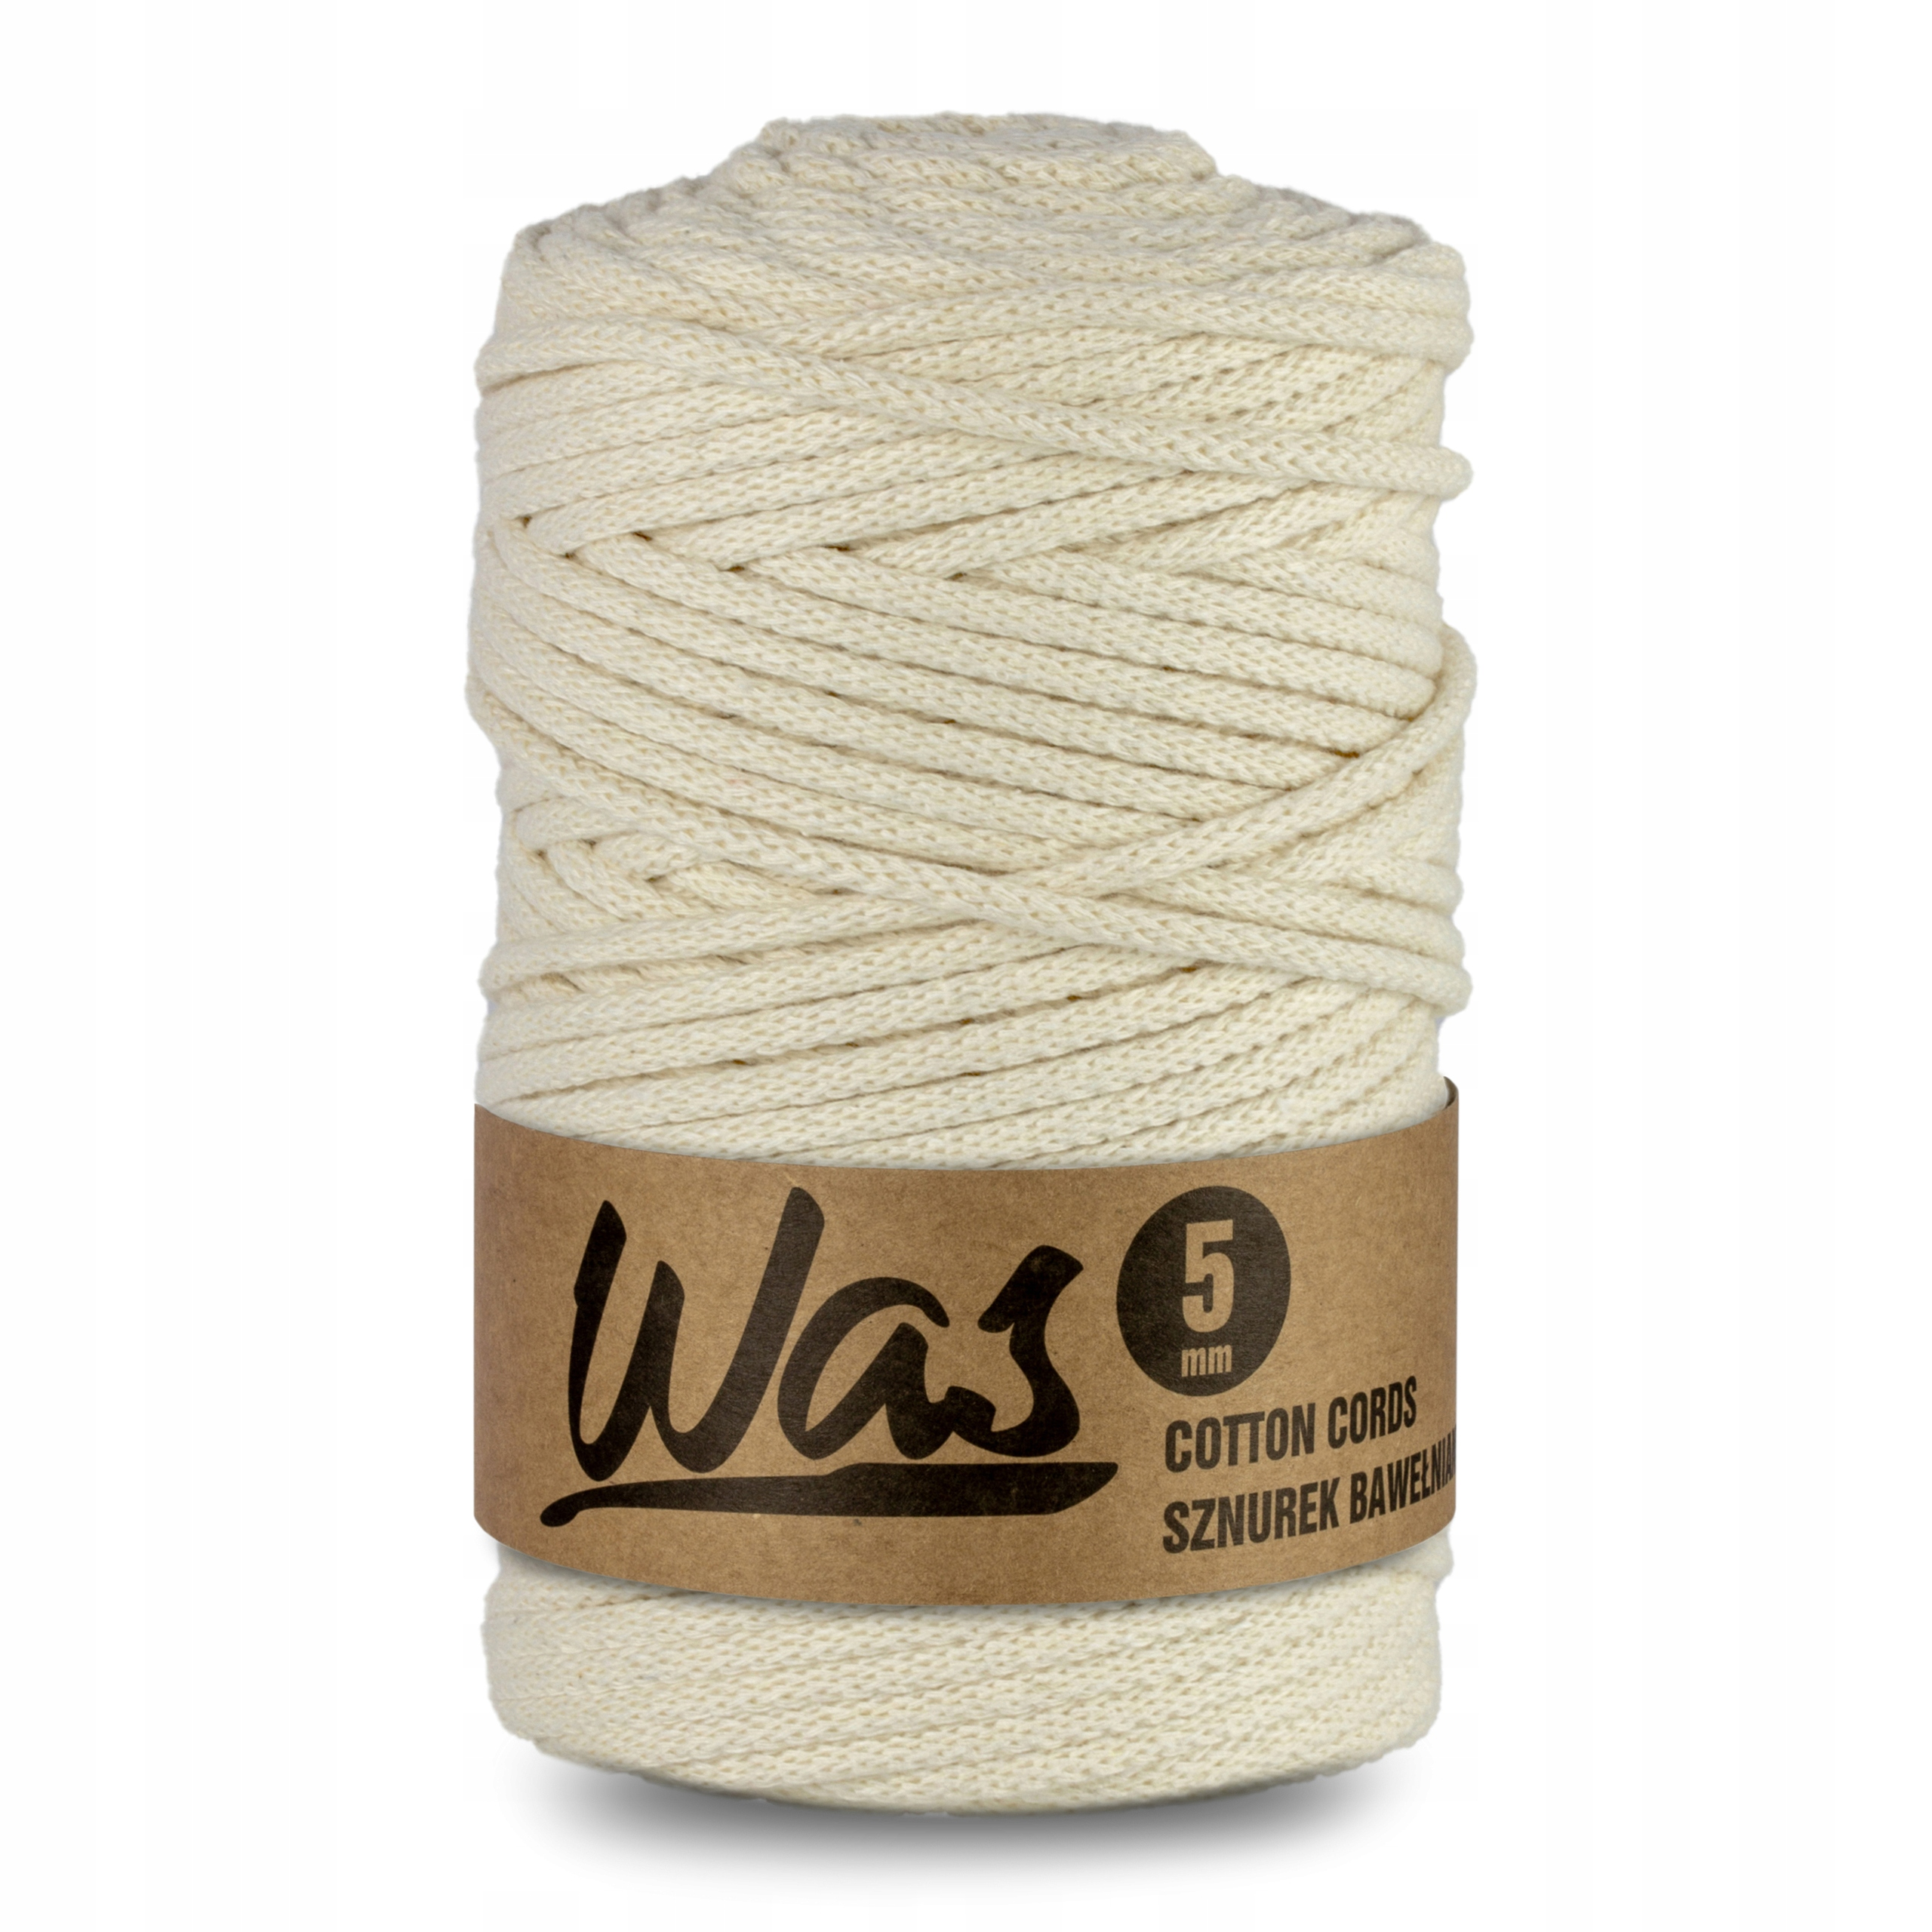 Item Cotton cord 5mm, 100m, ivory